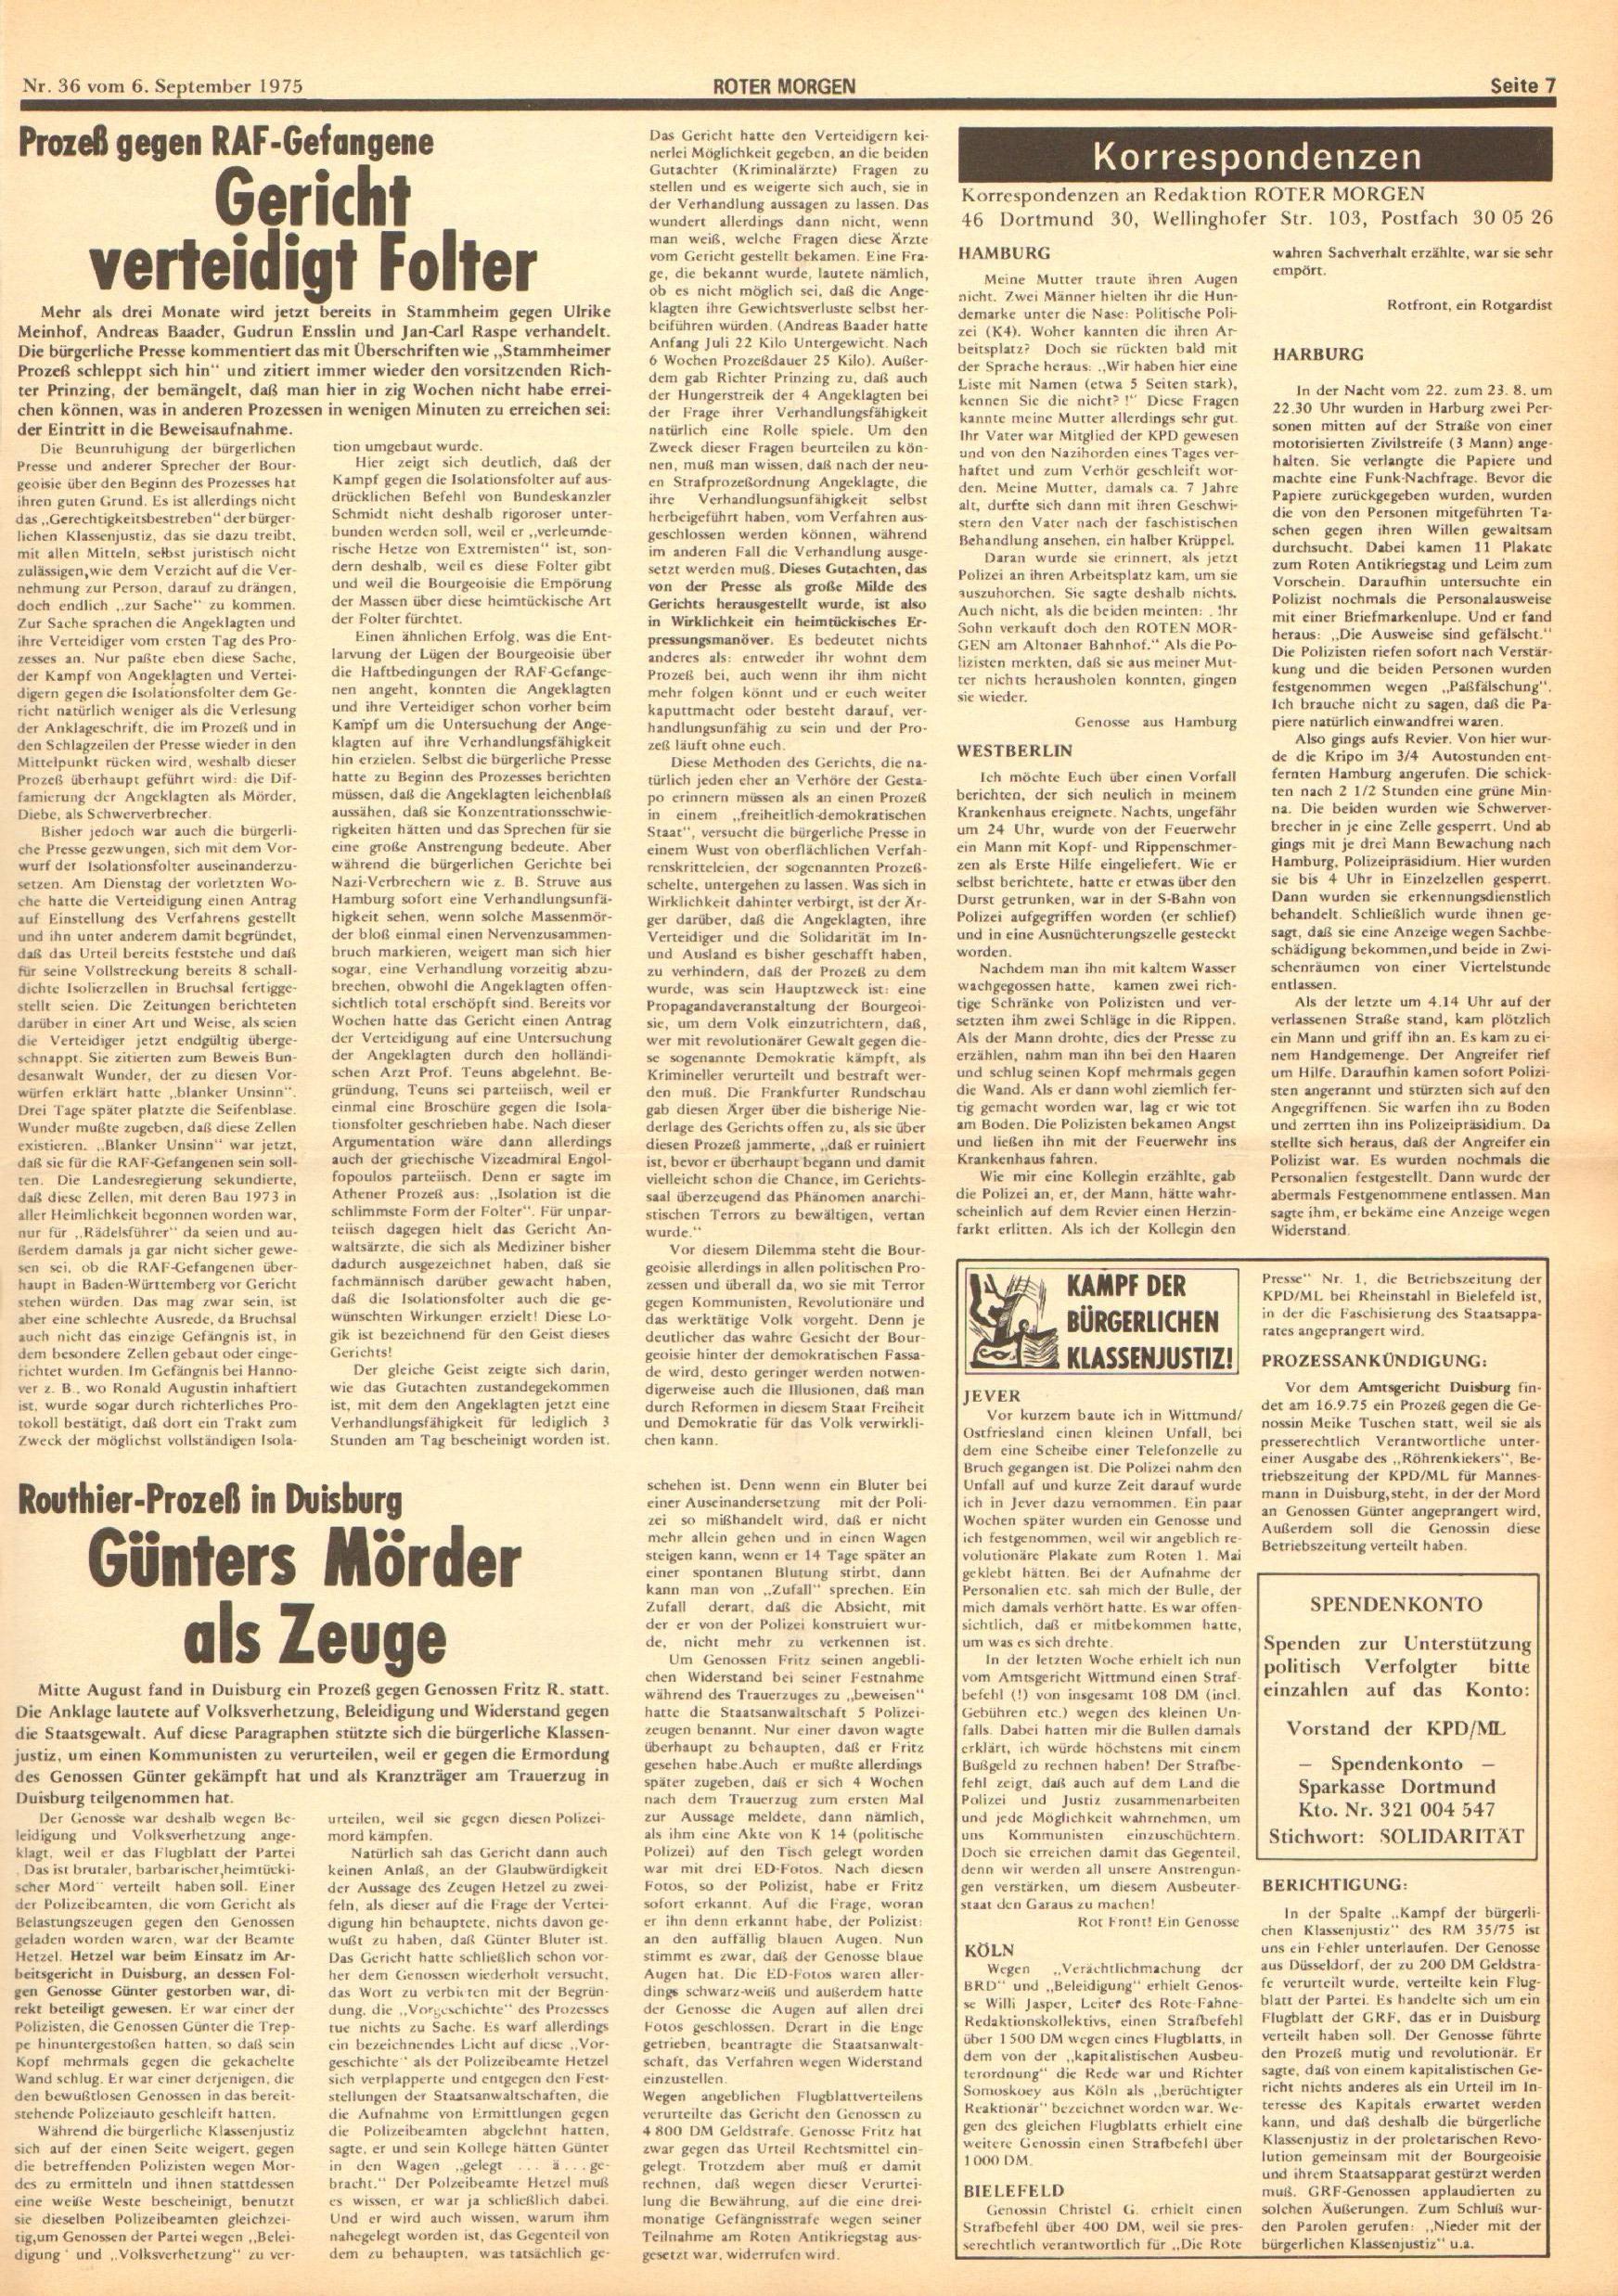 Roter Morgen, 9. Jg., 6. September 1975, Nr. 36, Seite 7